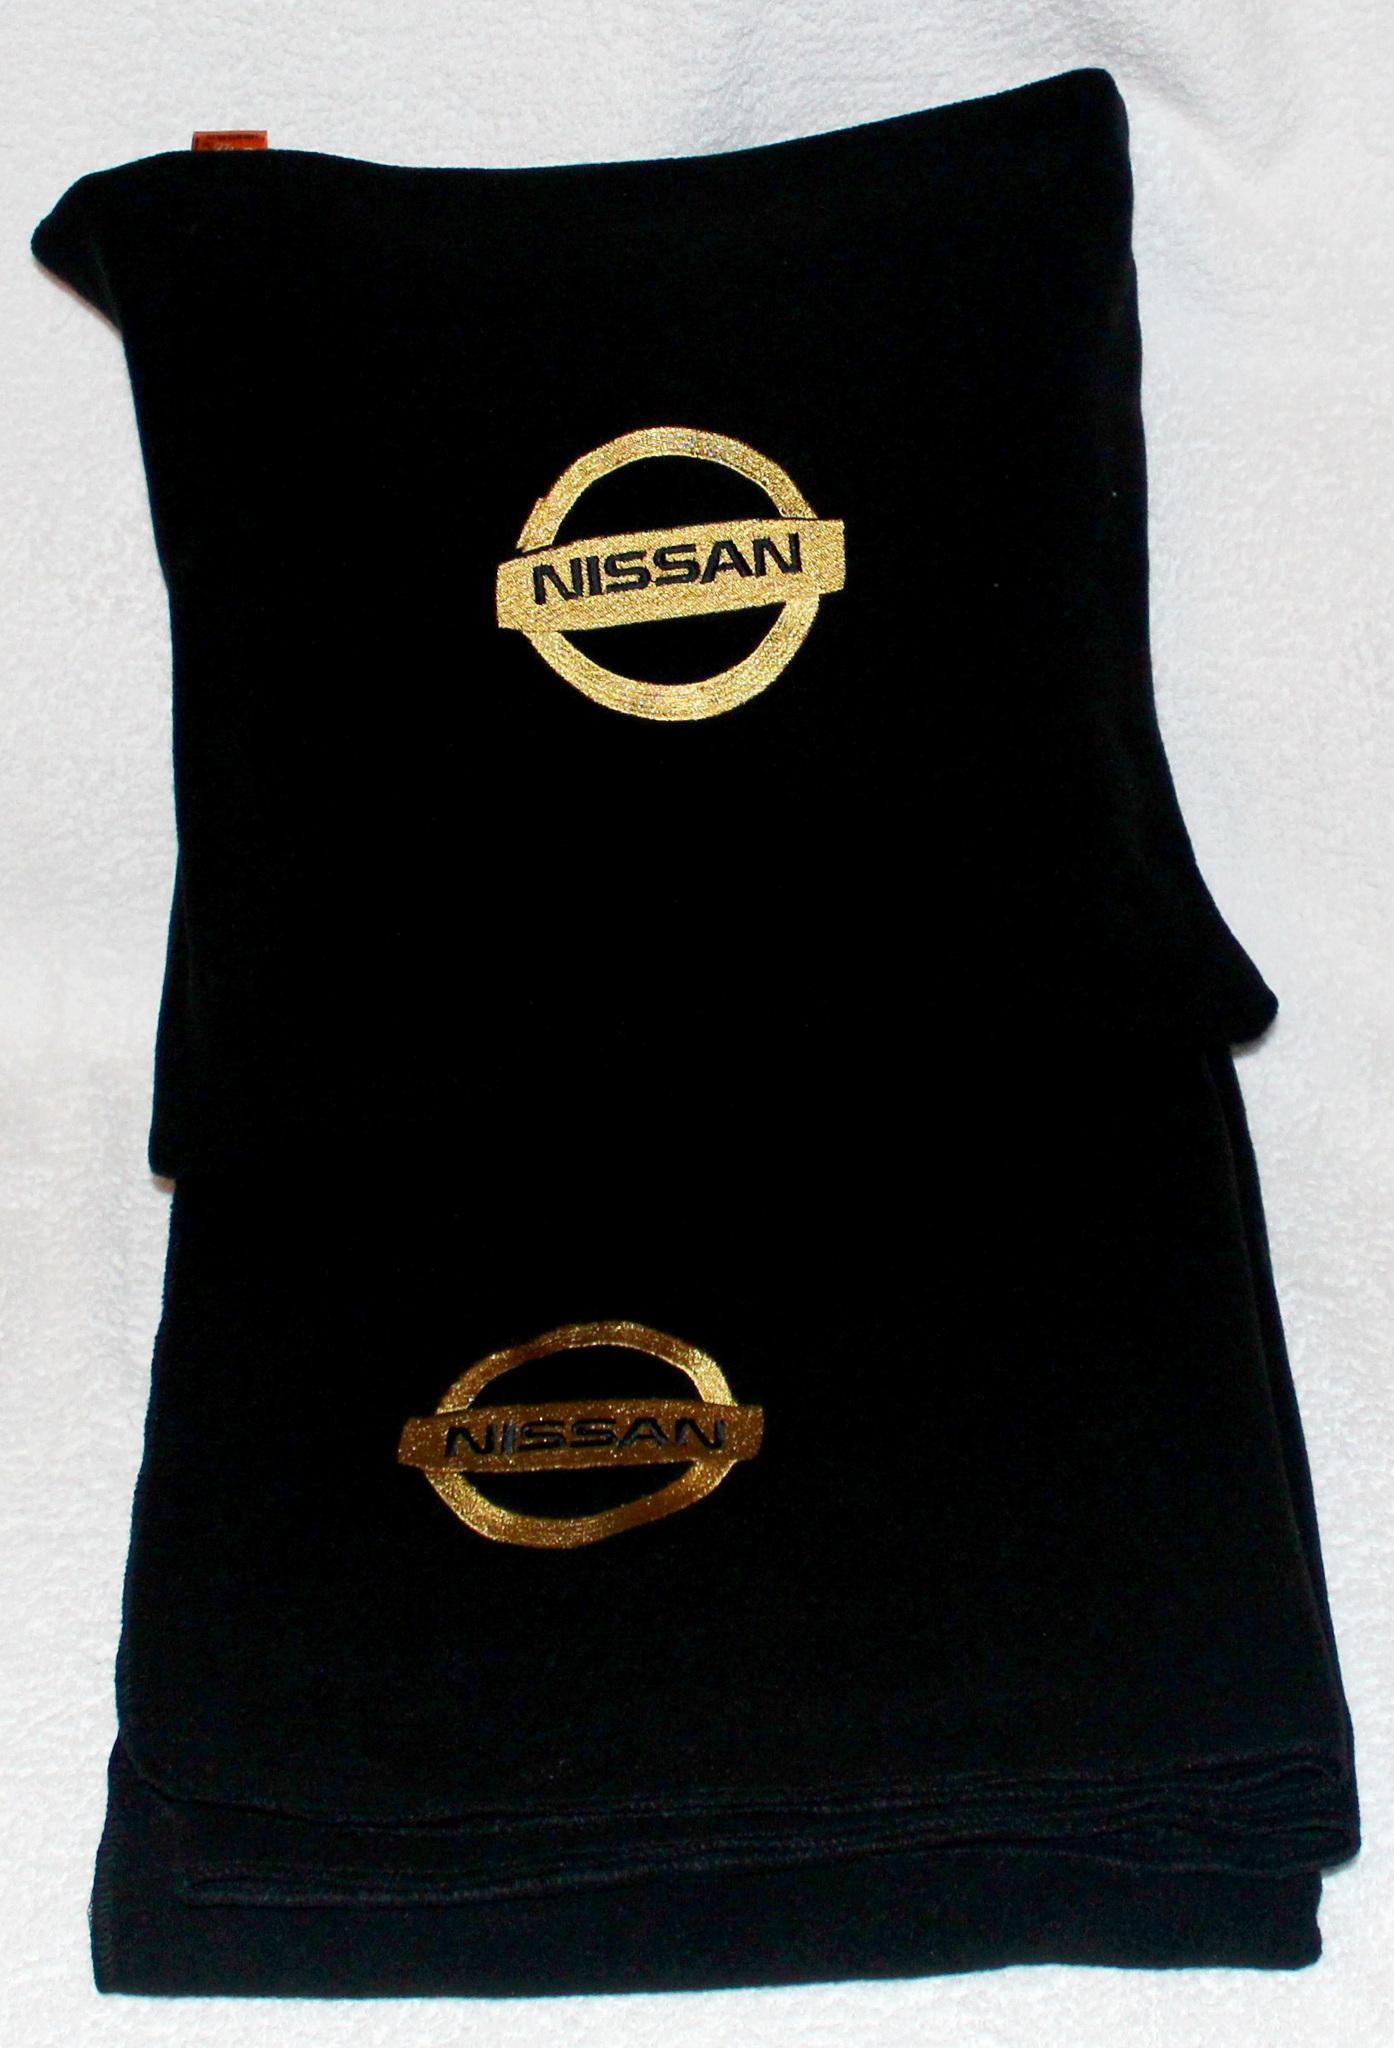 Плед в чехле с логотипом Nissan